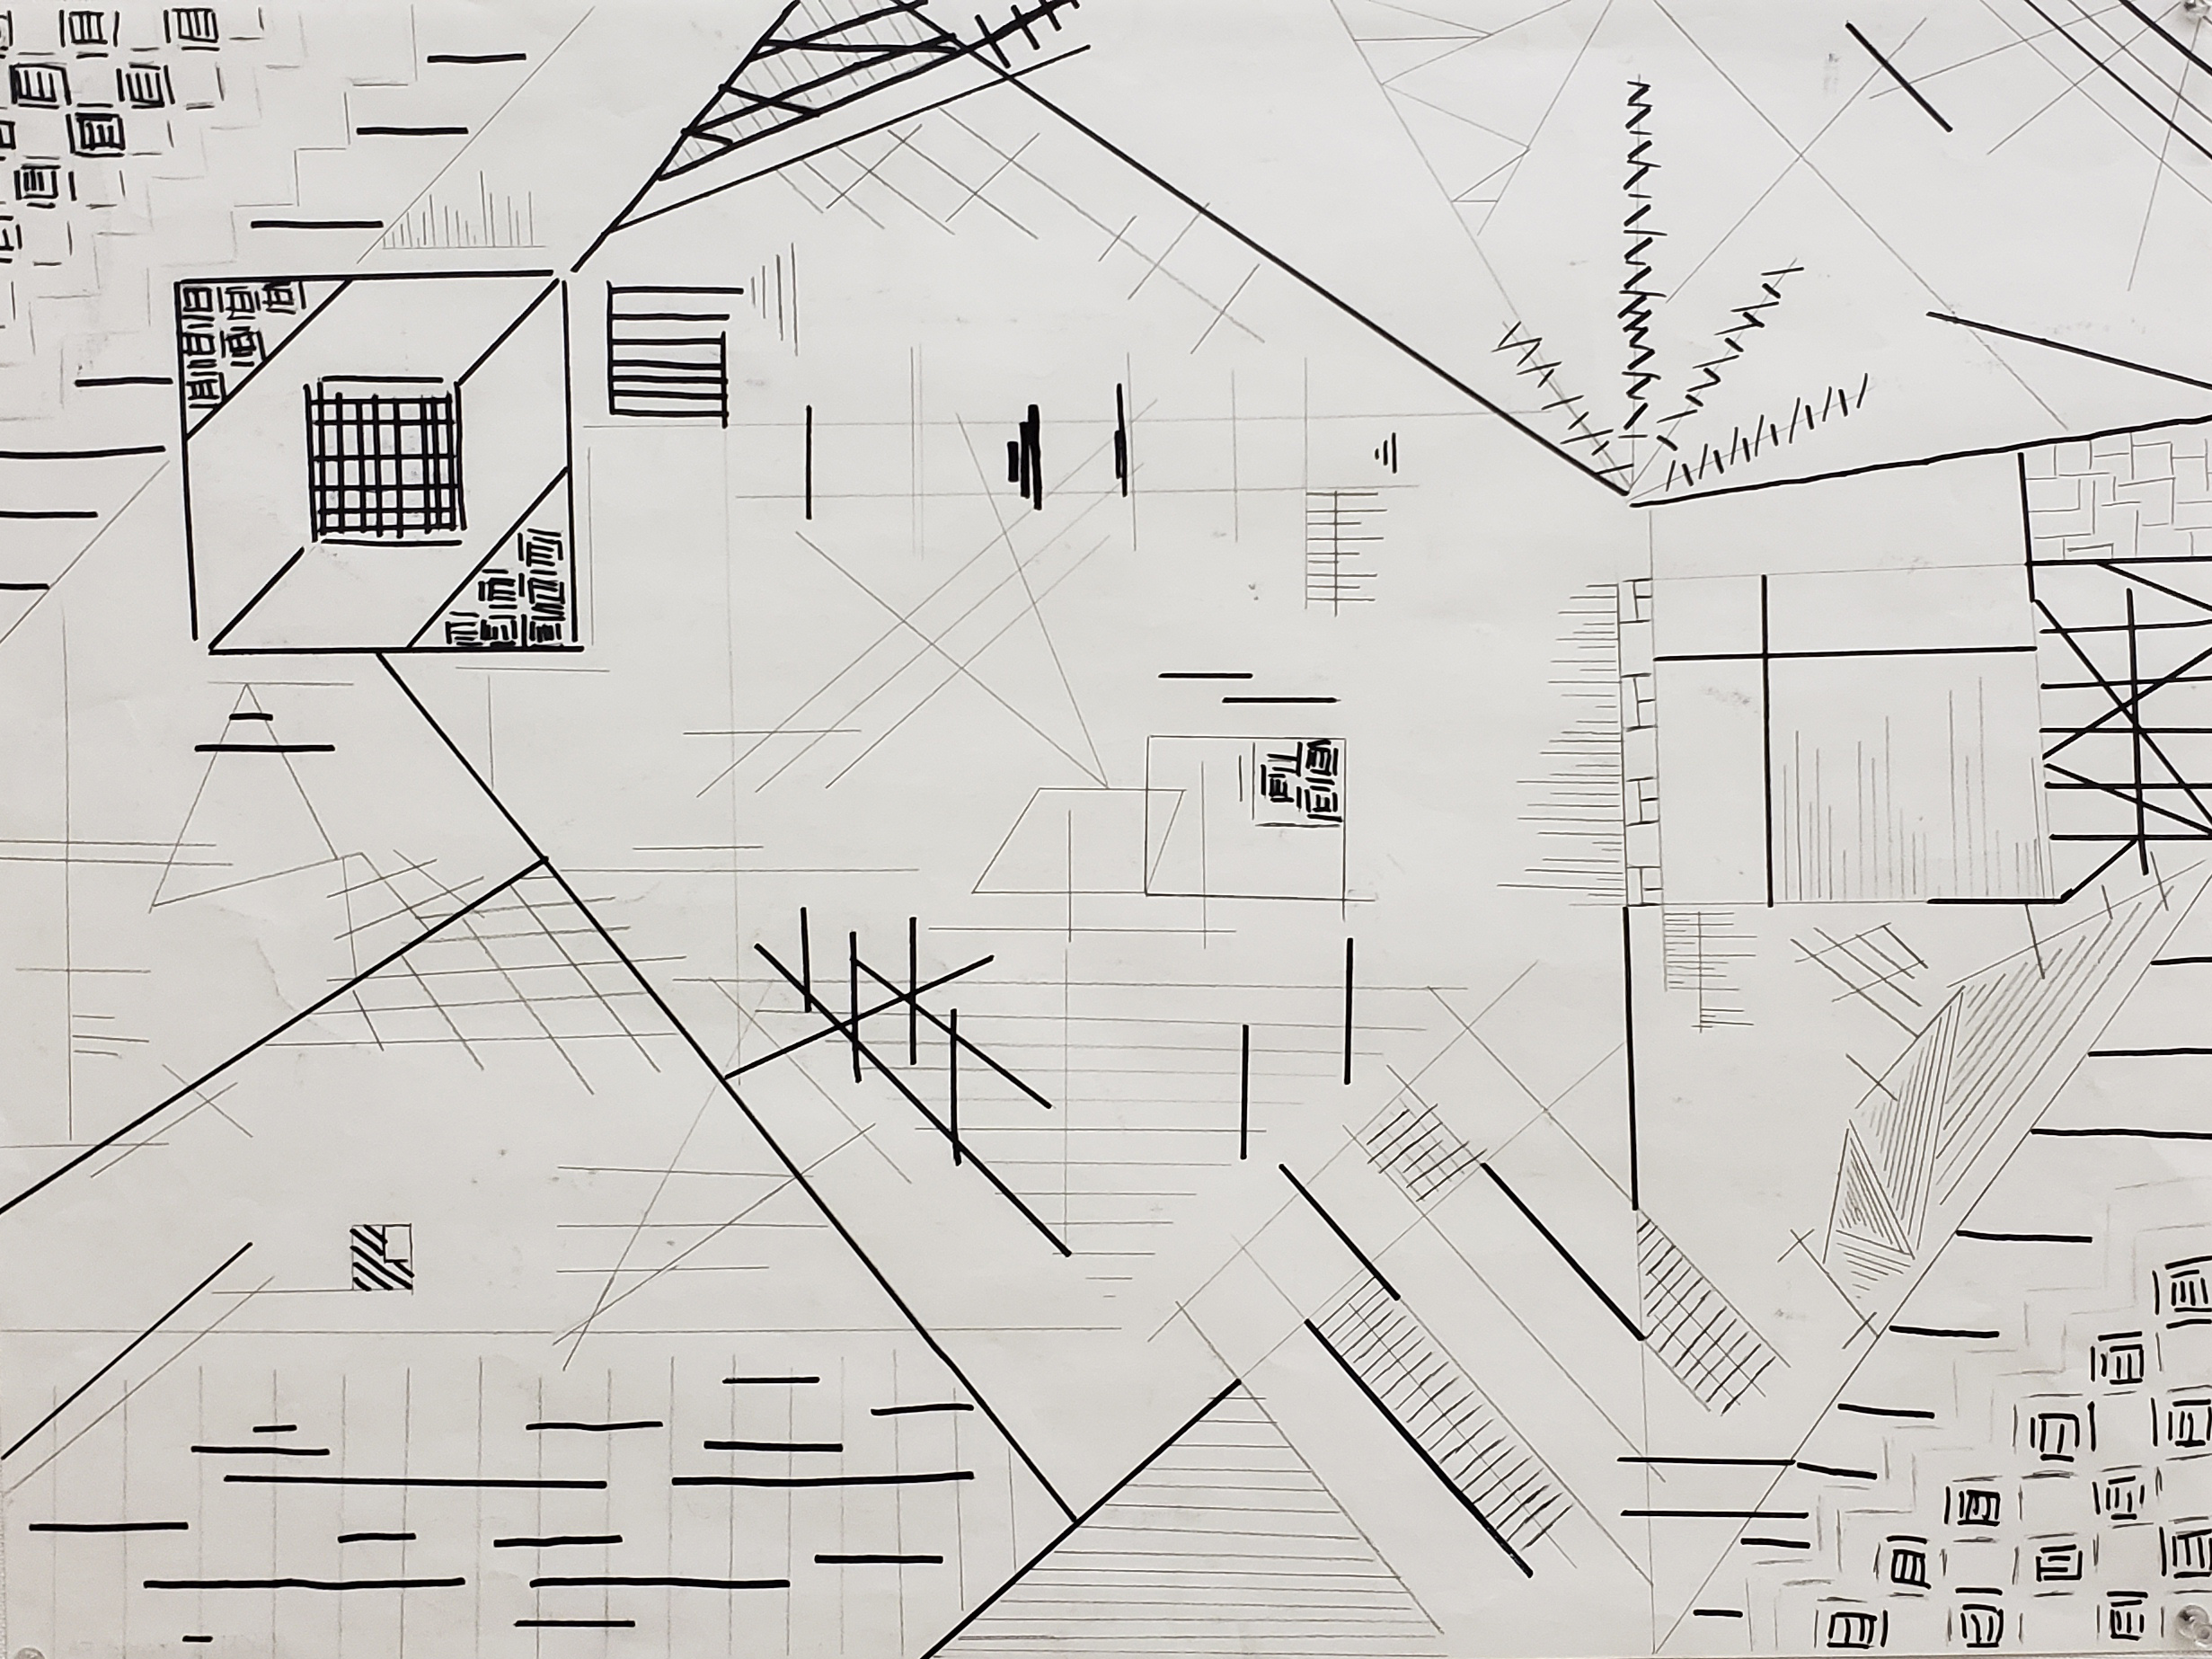 1,000 Mark Drawing - Beginning Drawing